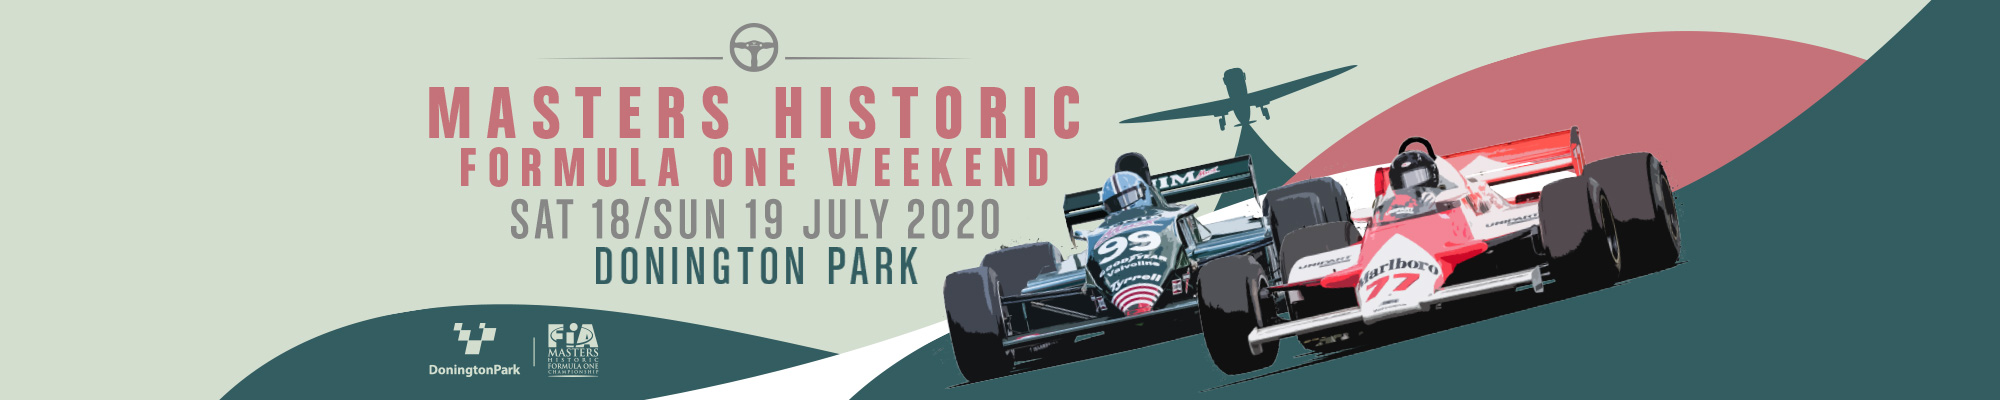 Masters Historic Formula One Weekend